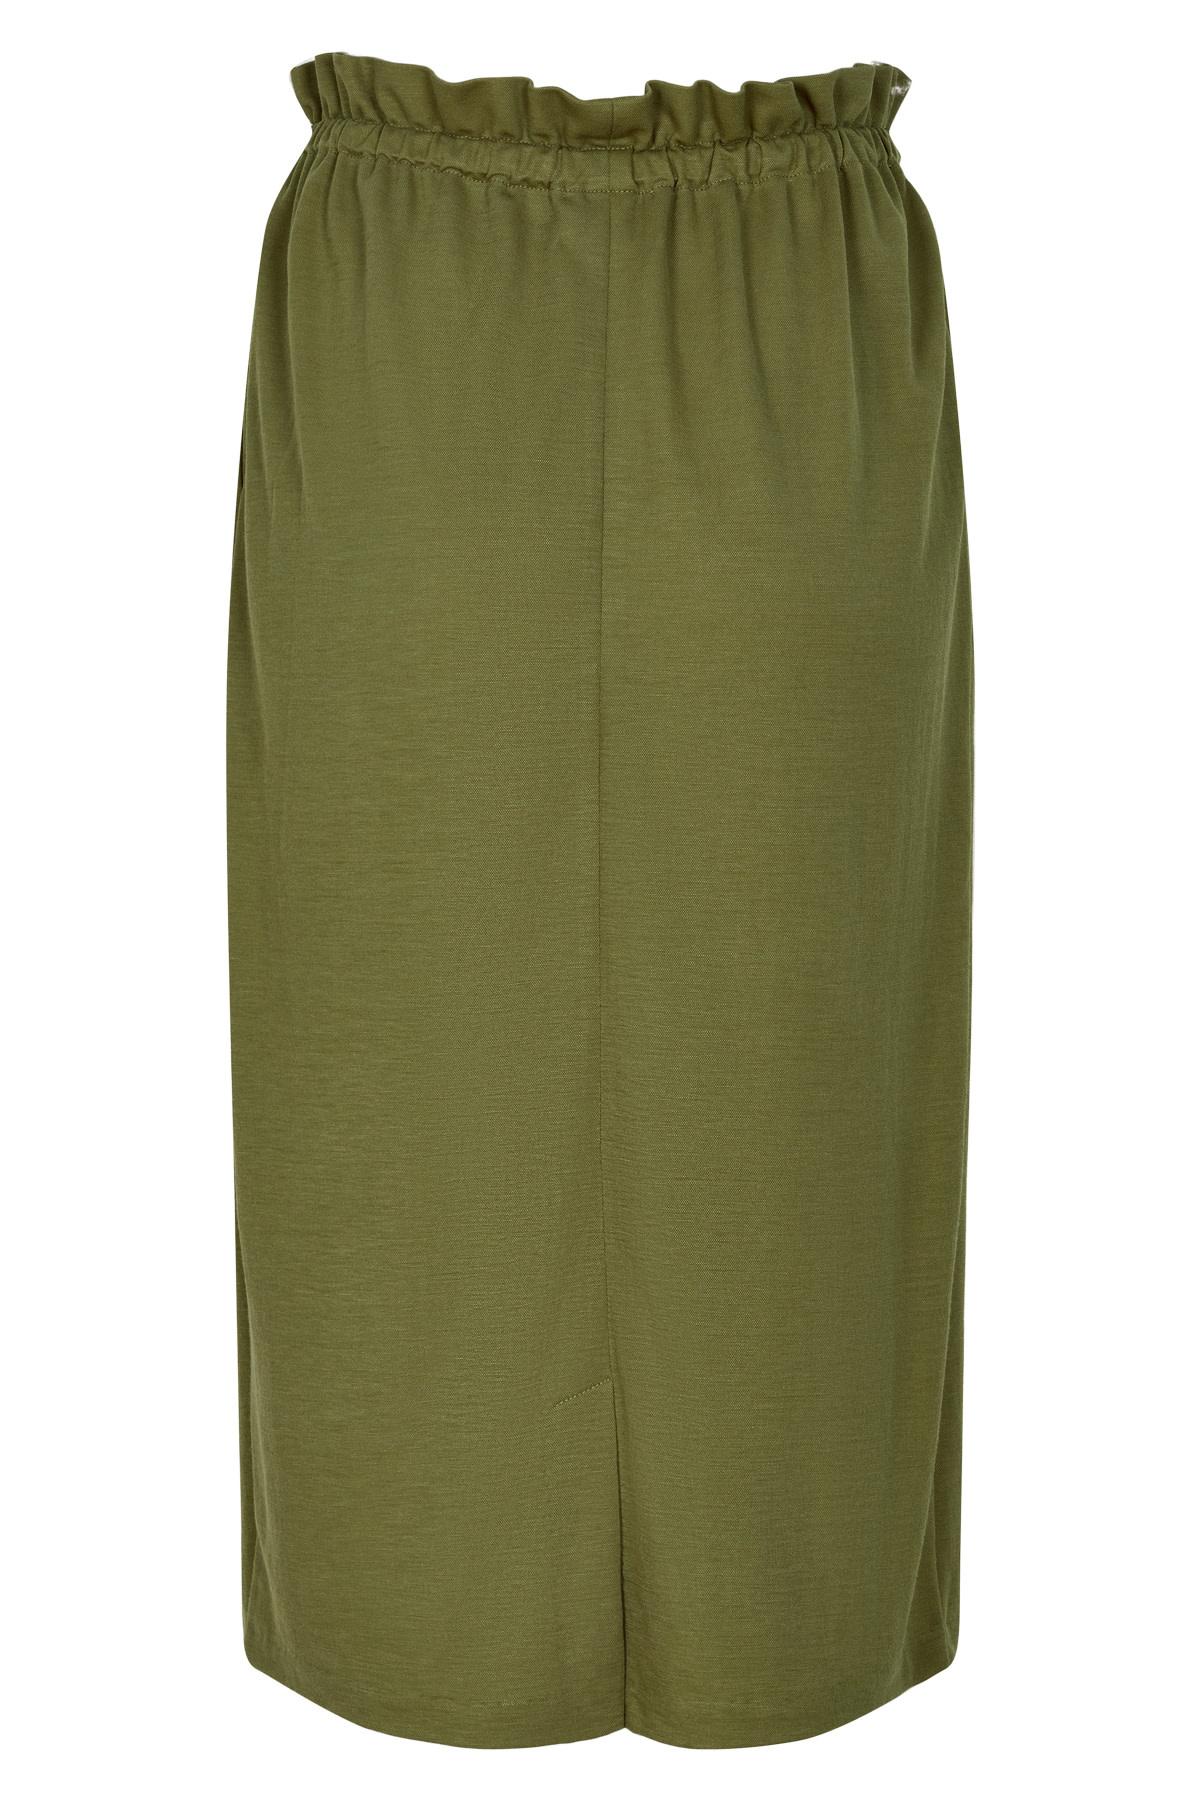 Nümph Avri Skirt